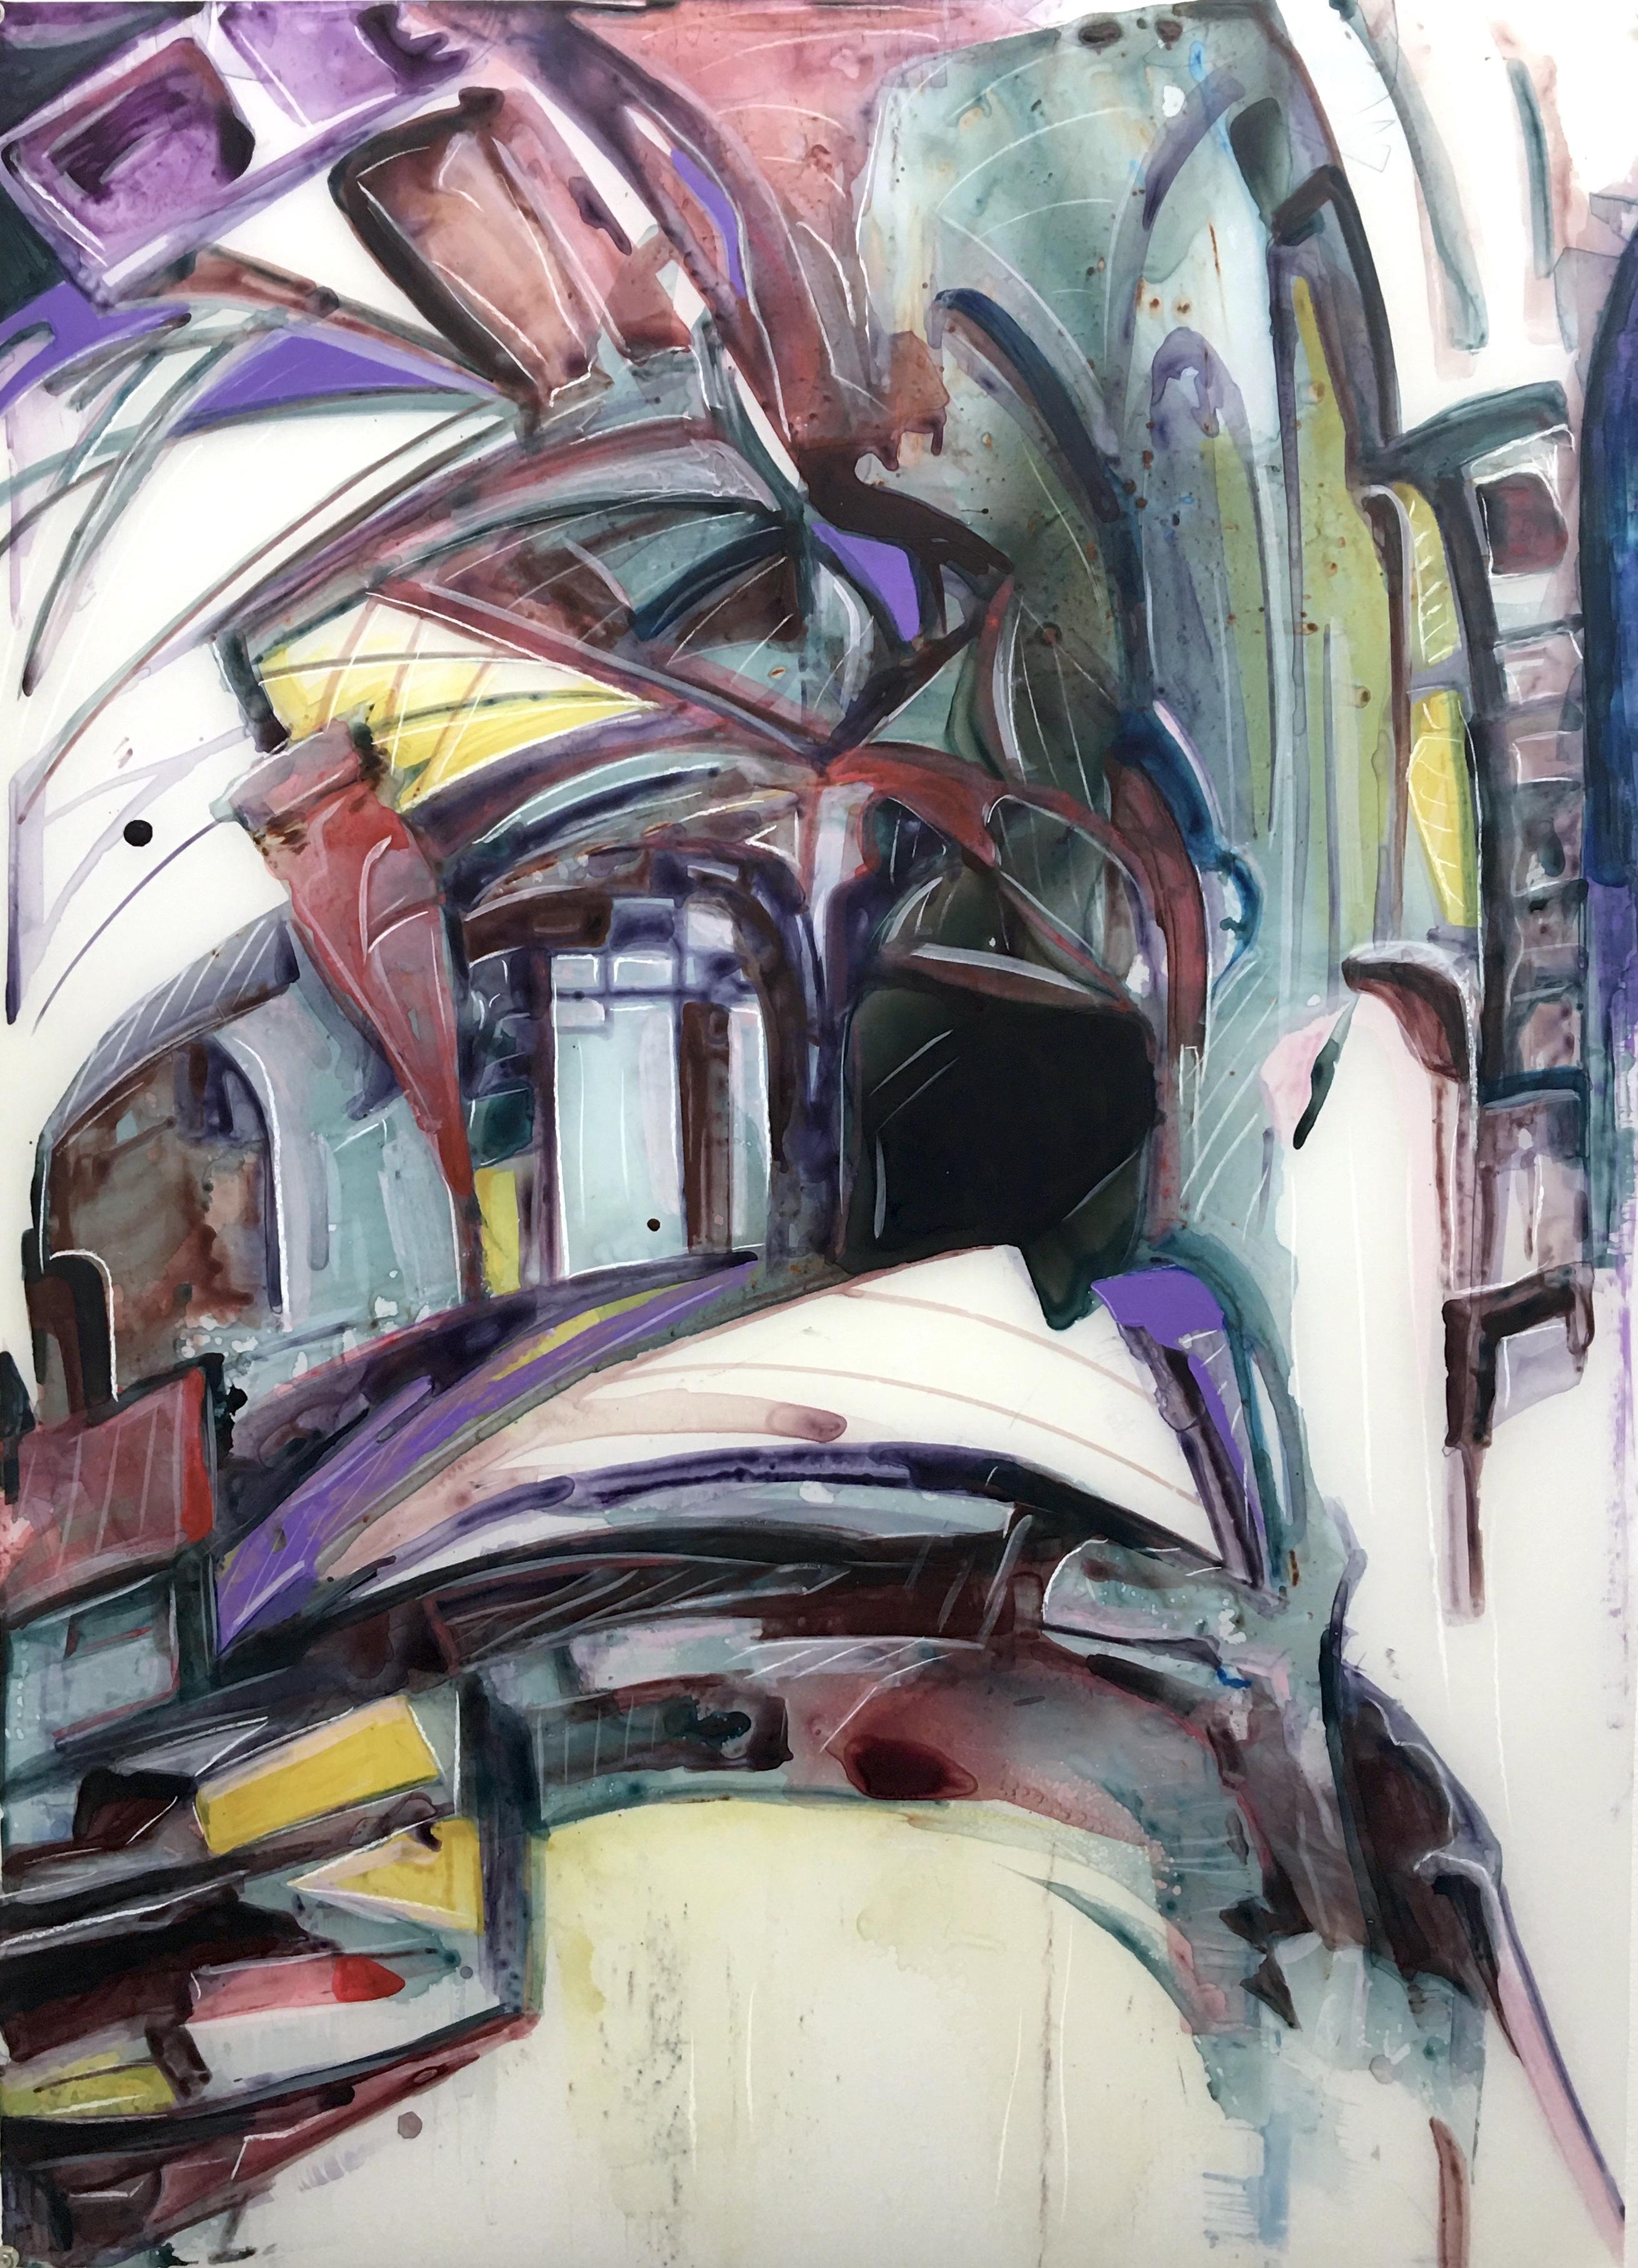 Courtyard, acrylic on mylar, 36x23 inches, 2020